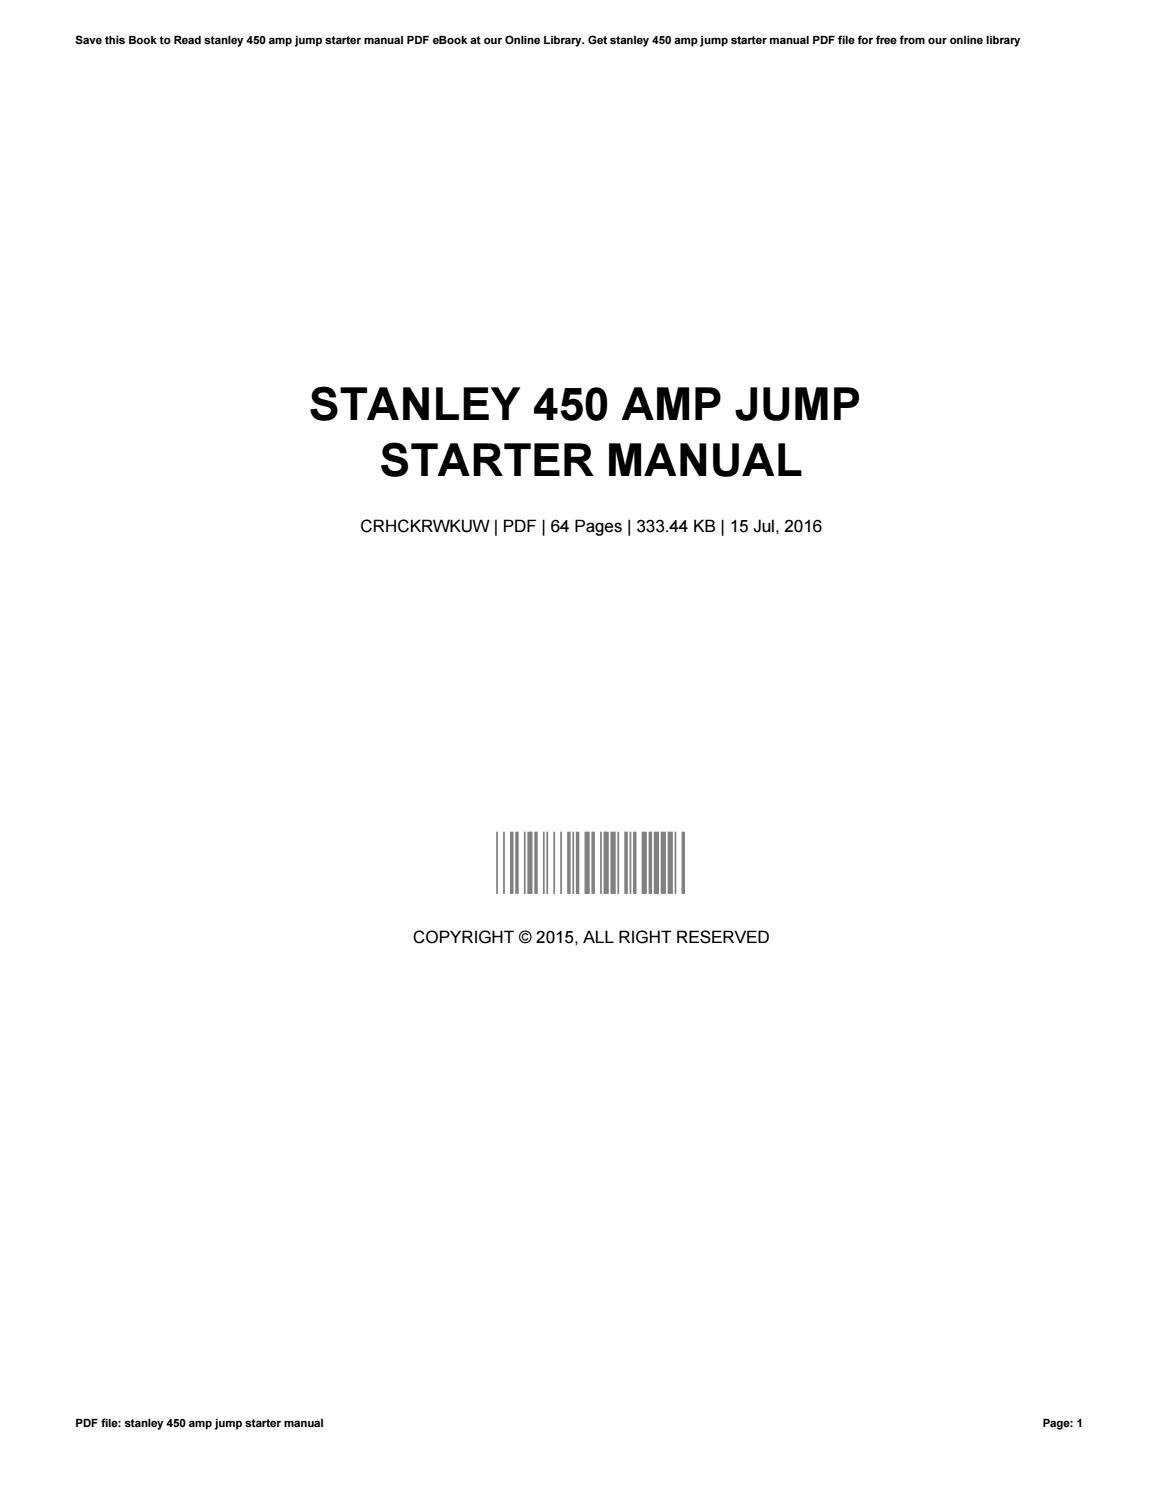 Stanley 450 Amp Jump Starter Manual By Rickydolan1577 Issuu